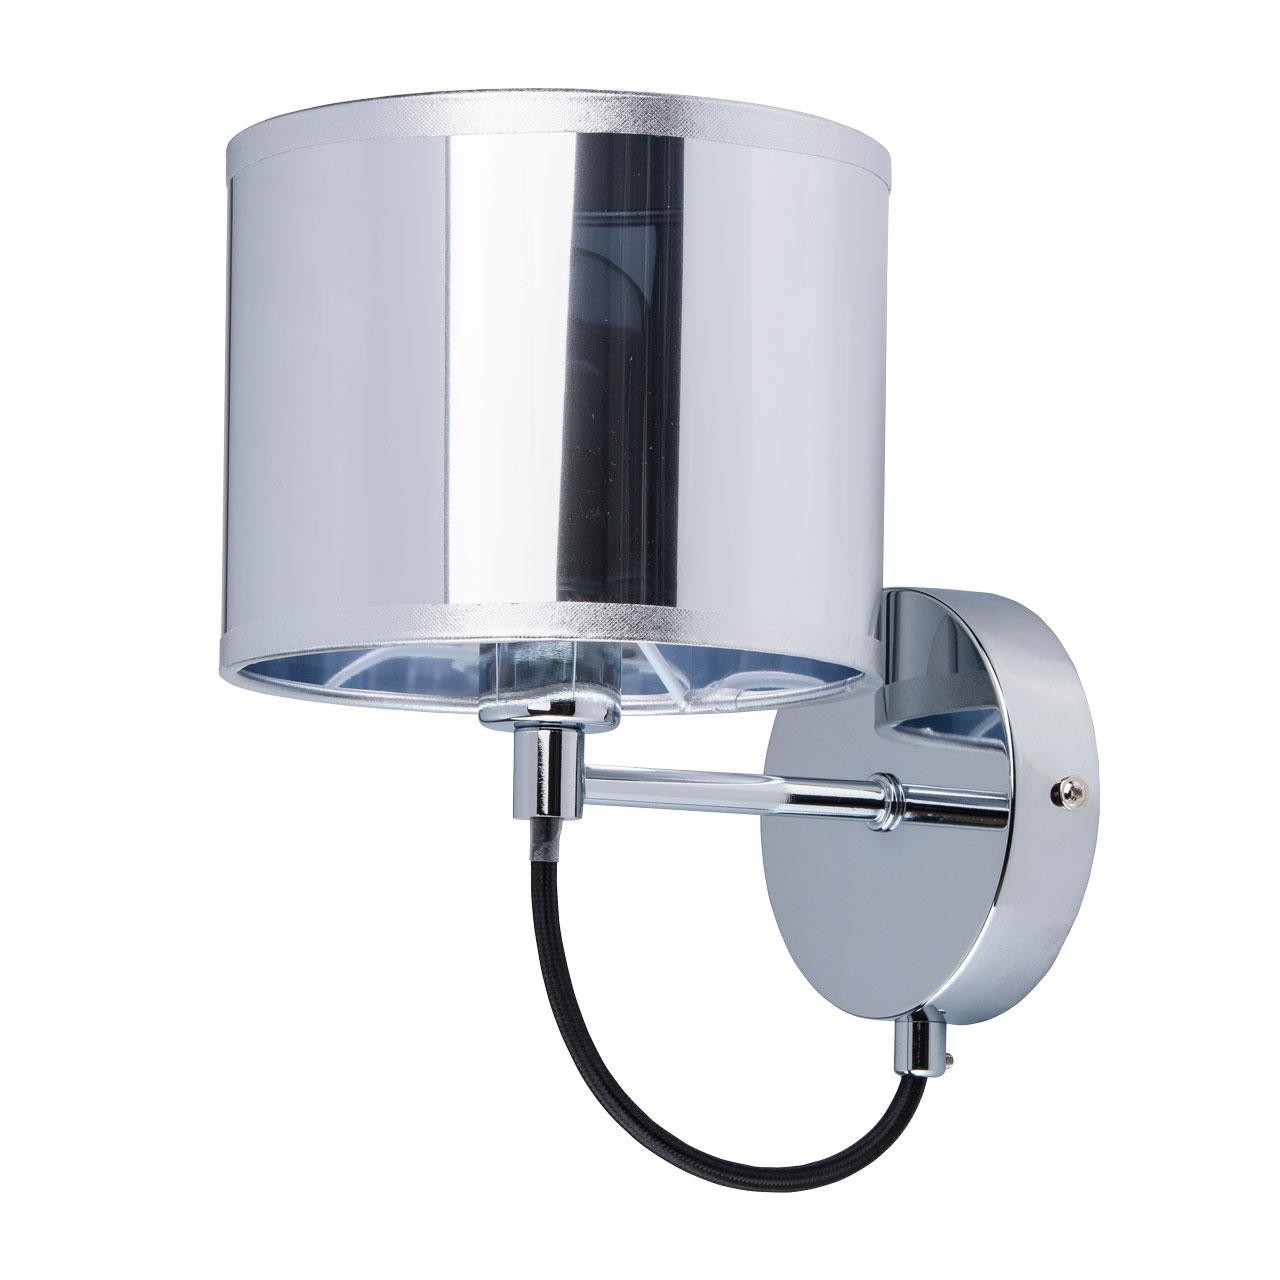 Бра MW-Light Лацио 3 103020701 бра mw light аврора 3 371021501